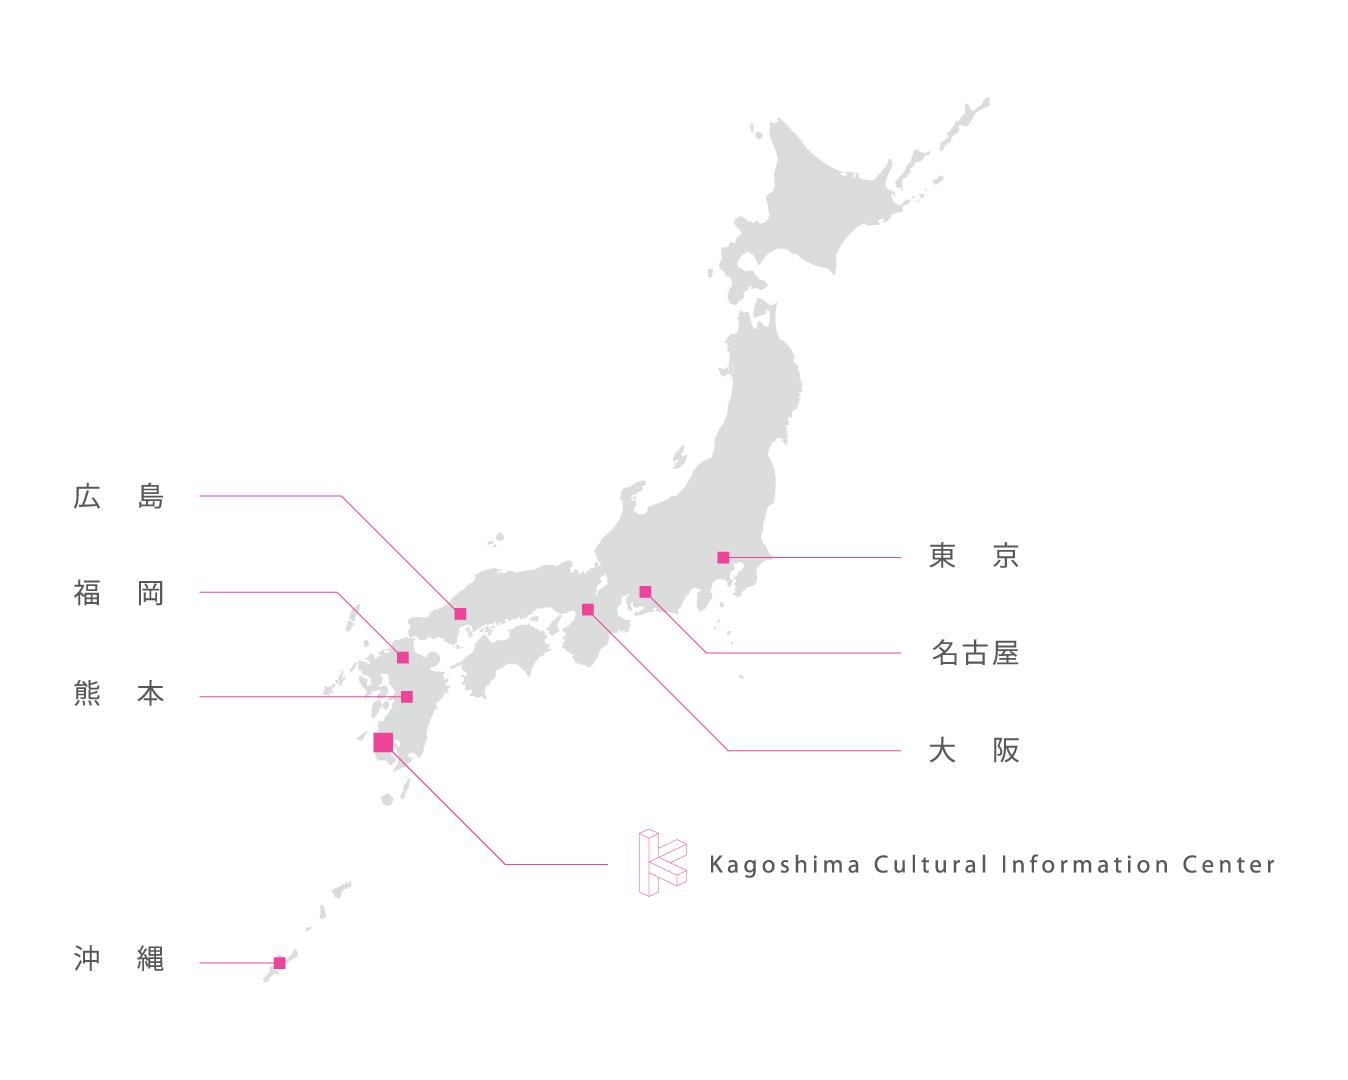 KCICマップ(日本地図)